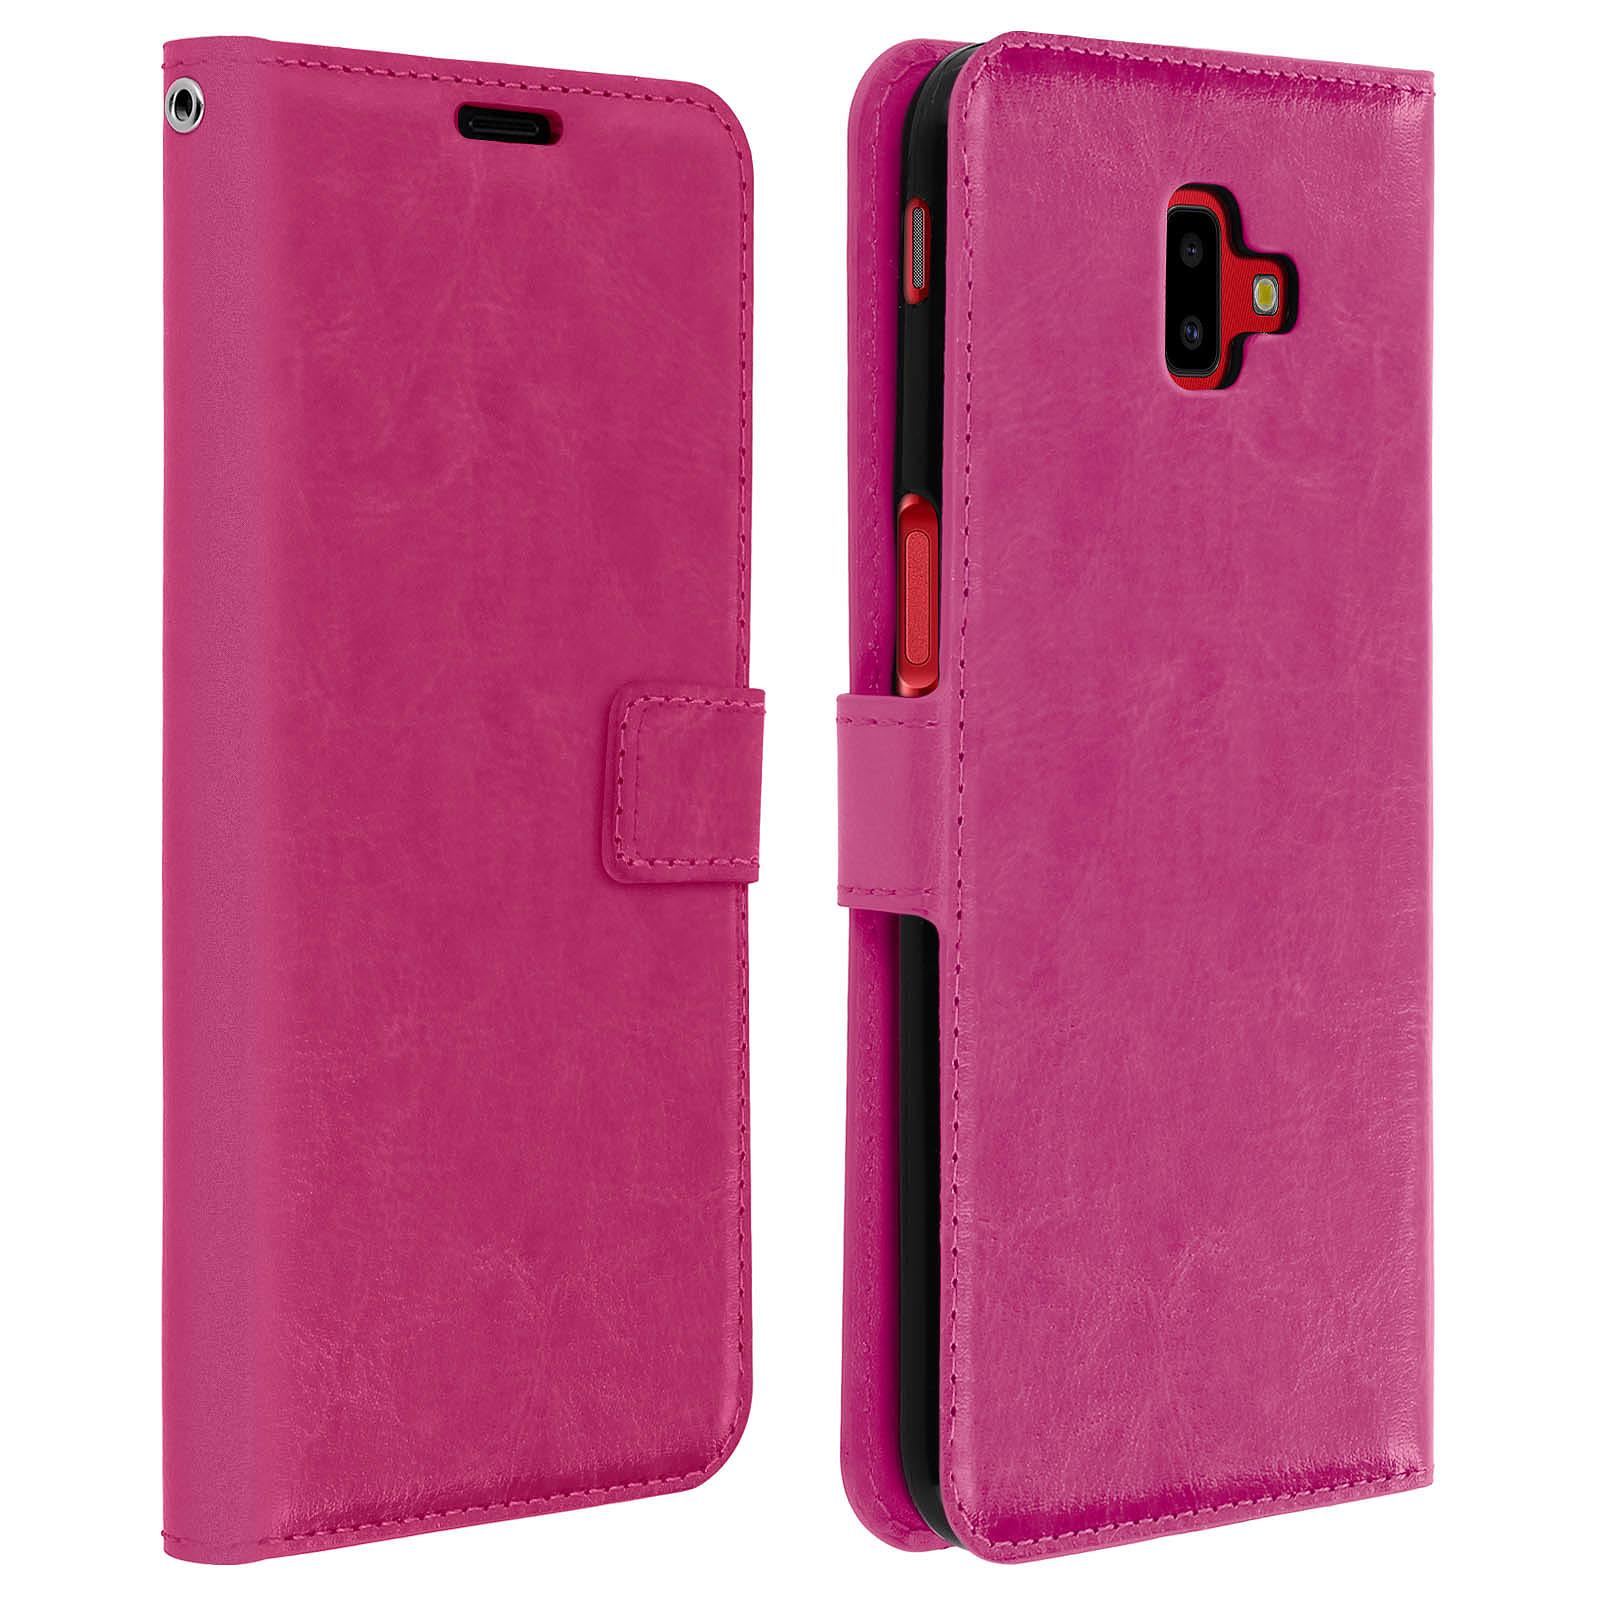 Avizar Etui folio Fuchsia pour Samsung Galaxy J6 Plus